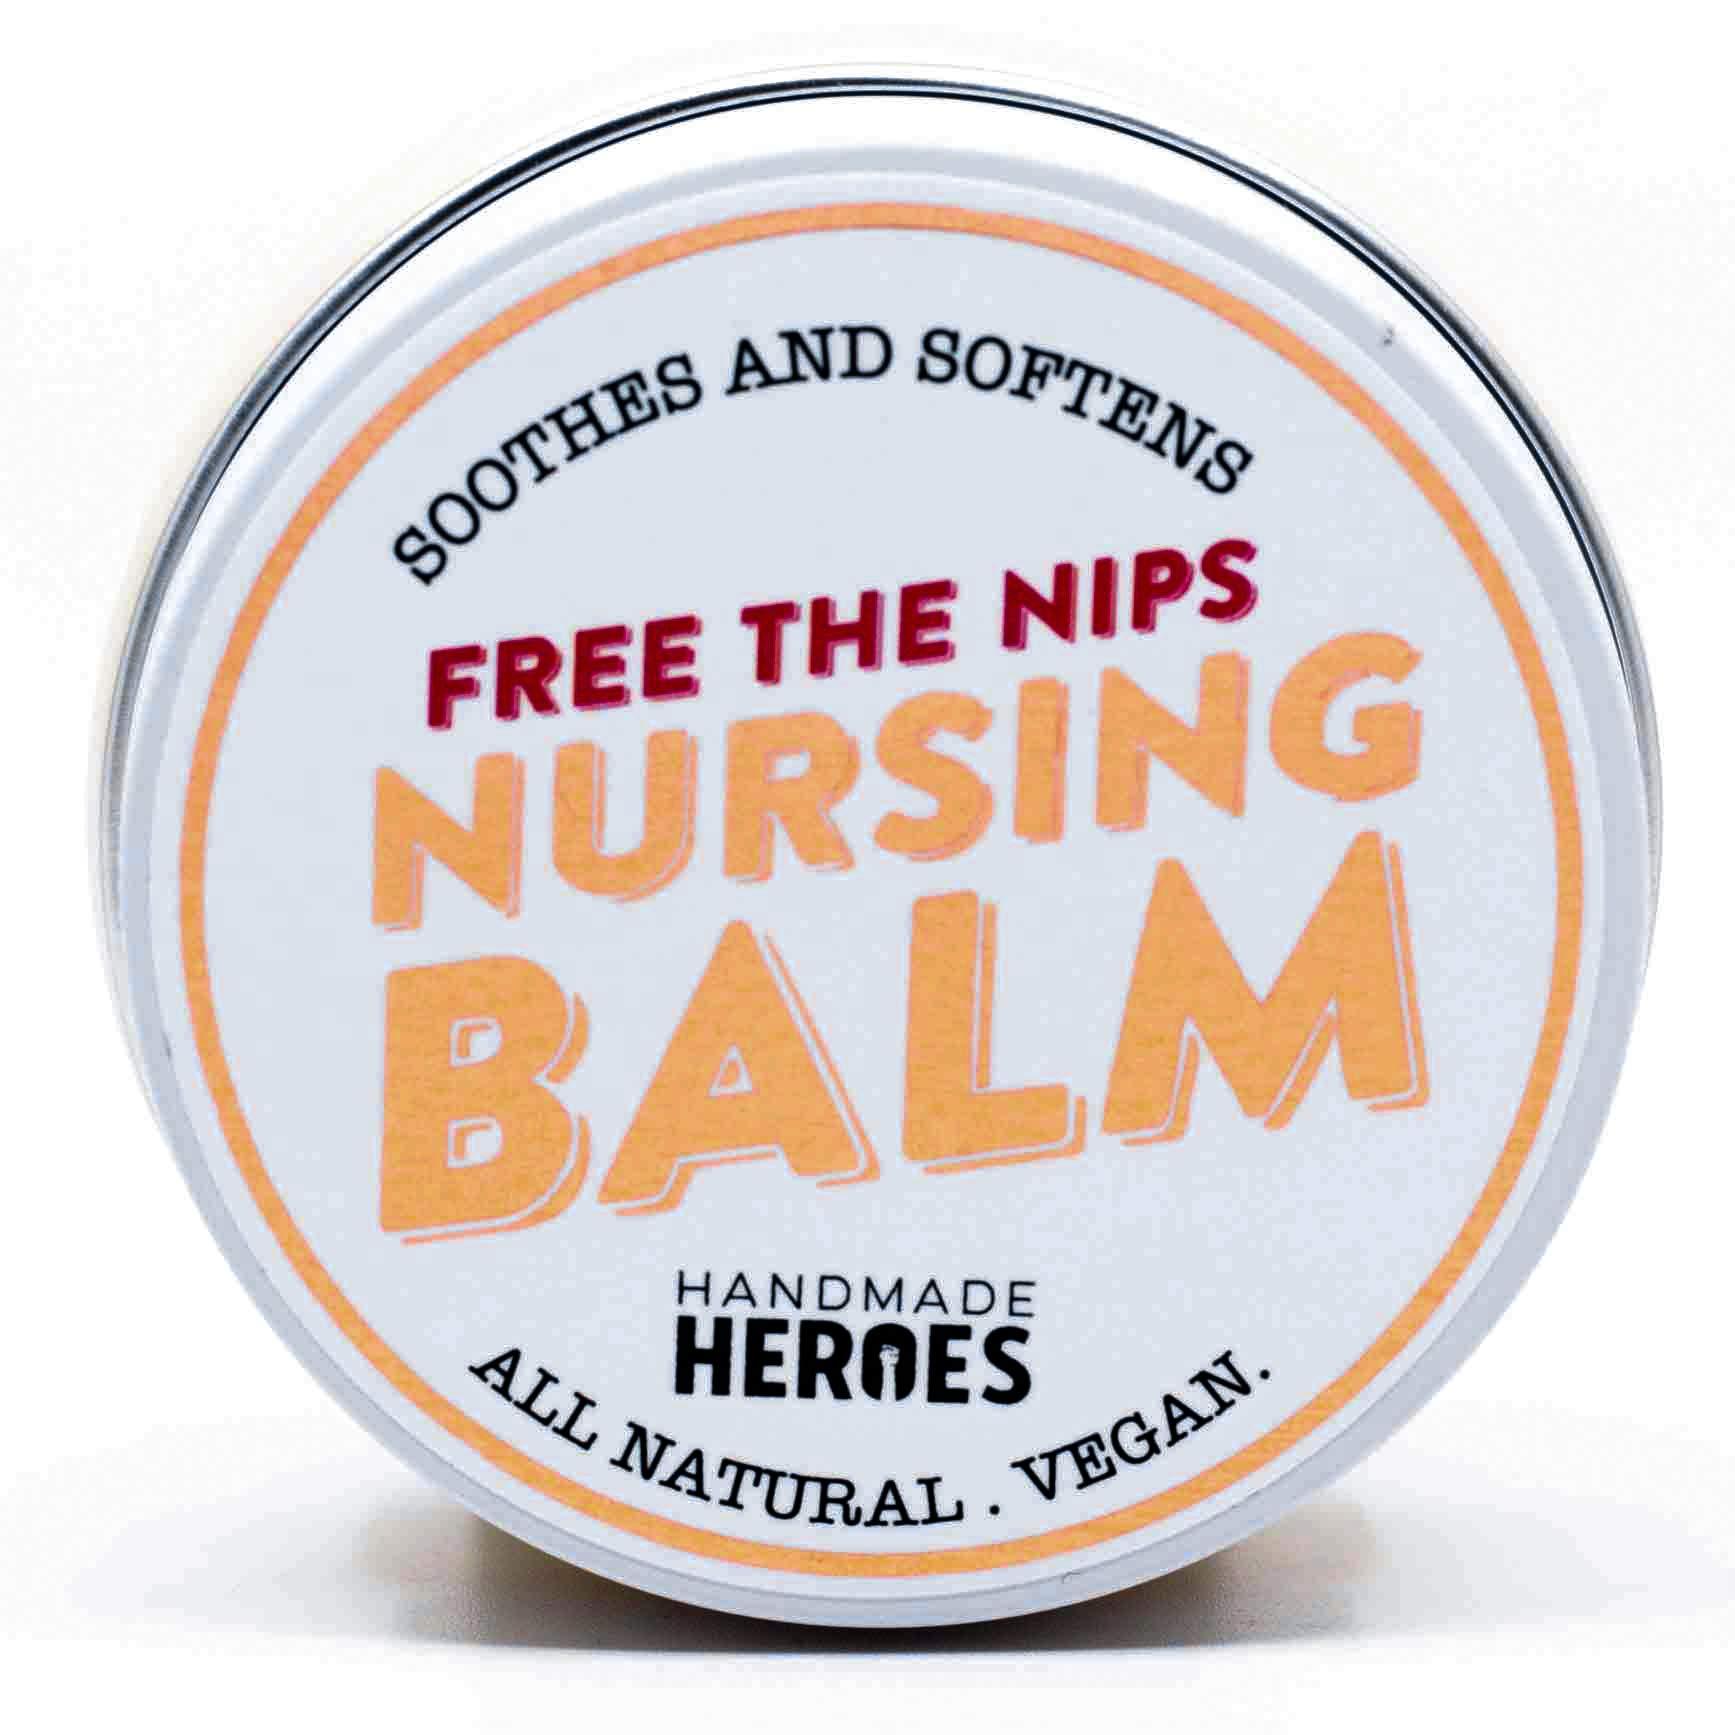 100% Natural & Vegan Nipple Balm with Calendula Extract, Nipple Cream for Cracked Nipples and Growing Breast Feeding Nipples, 2oz